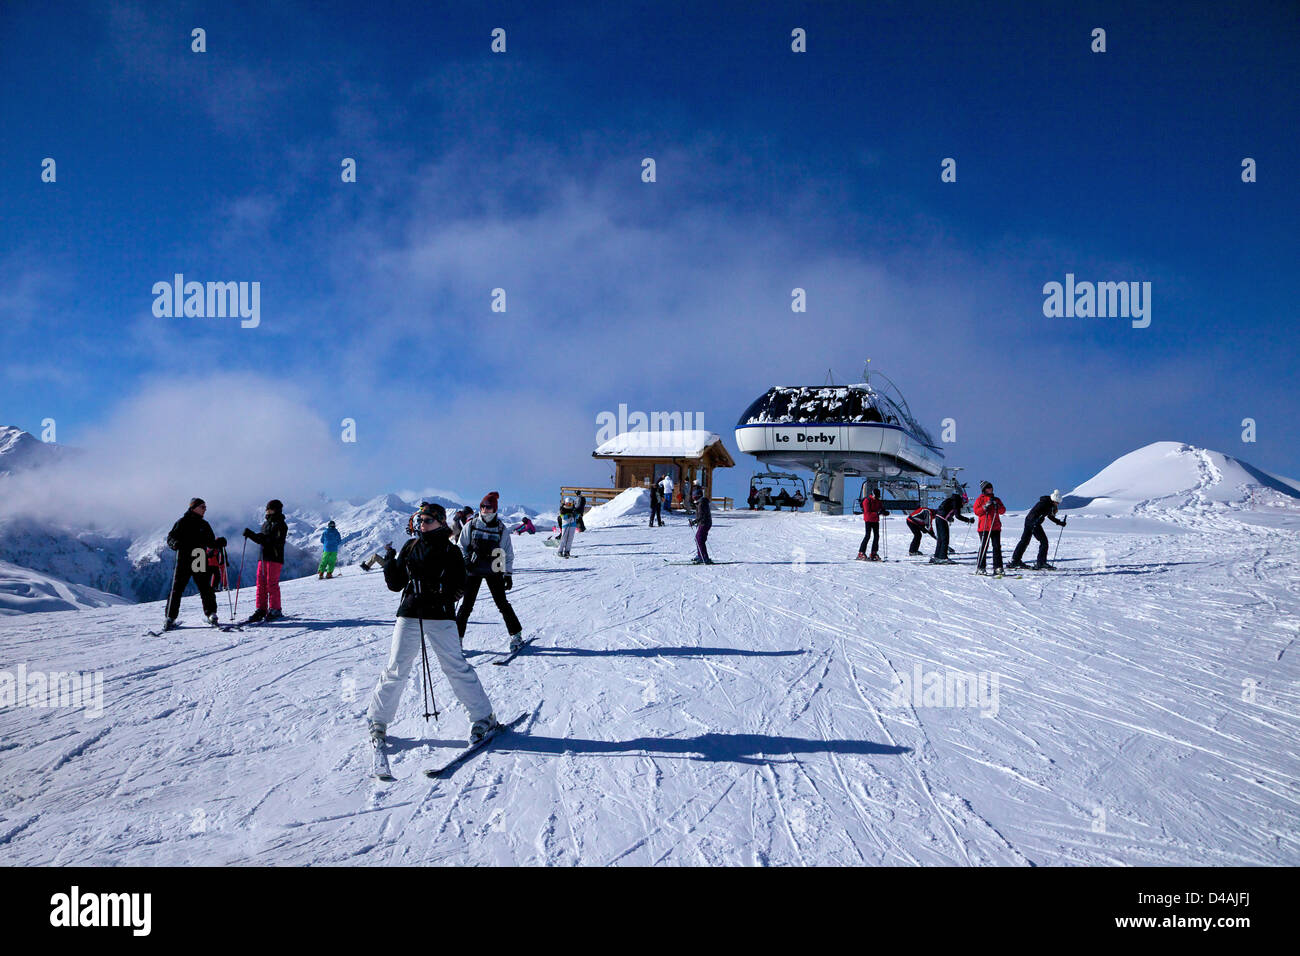 Le Derby chairlift, Les Arcs, Savoie, France, Europe - Stock Image